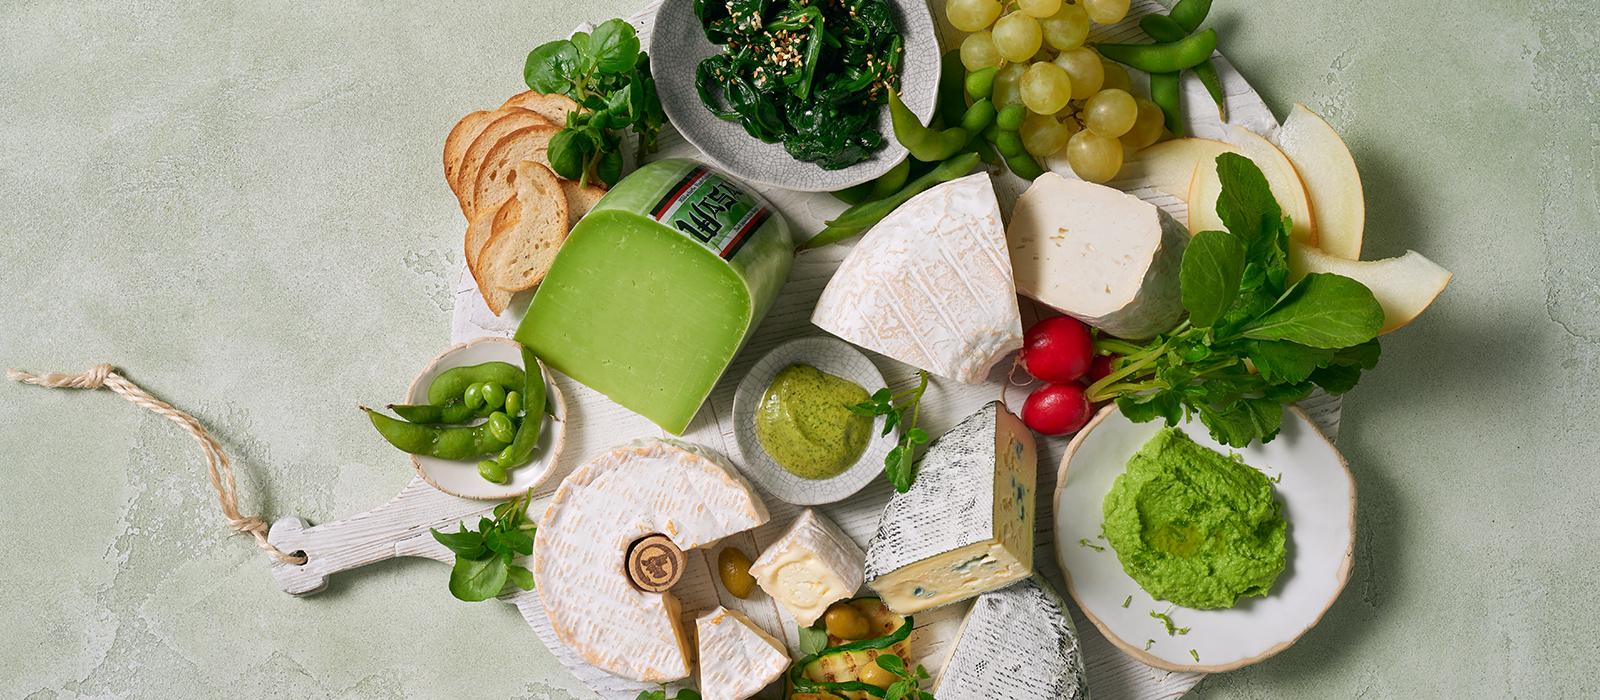 Grünes Foodboard